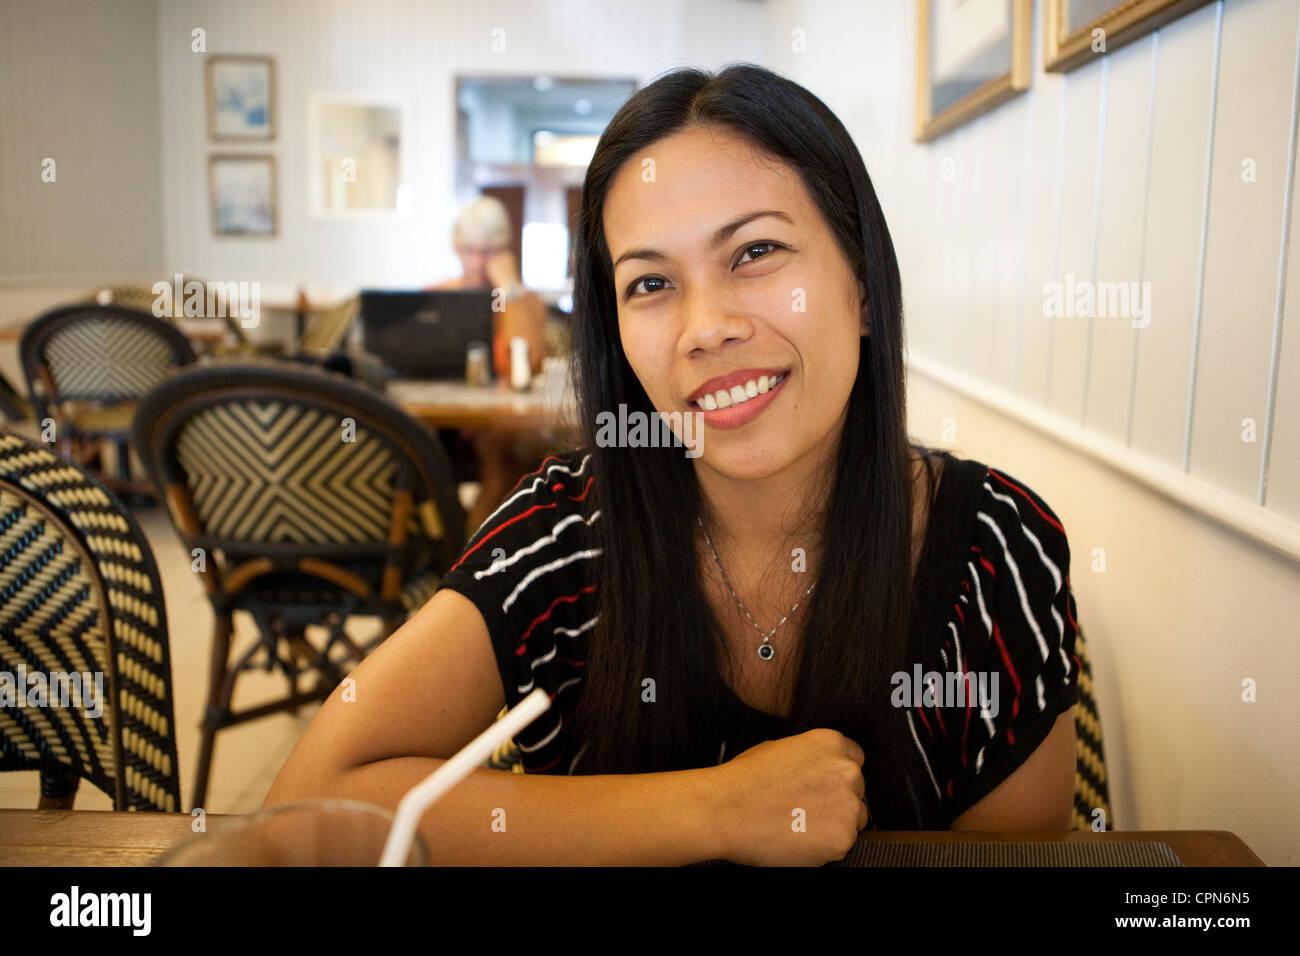 f5f7945053a Filipino woman sitting inside Cafe de France restaurant. Lapu-Lapu City